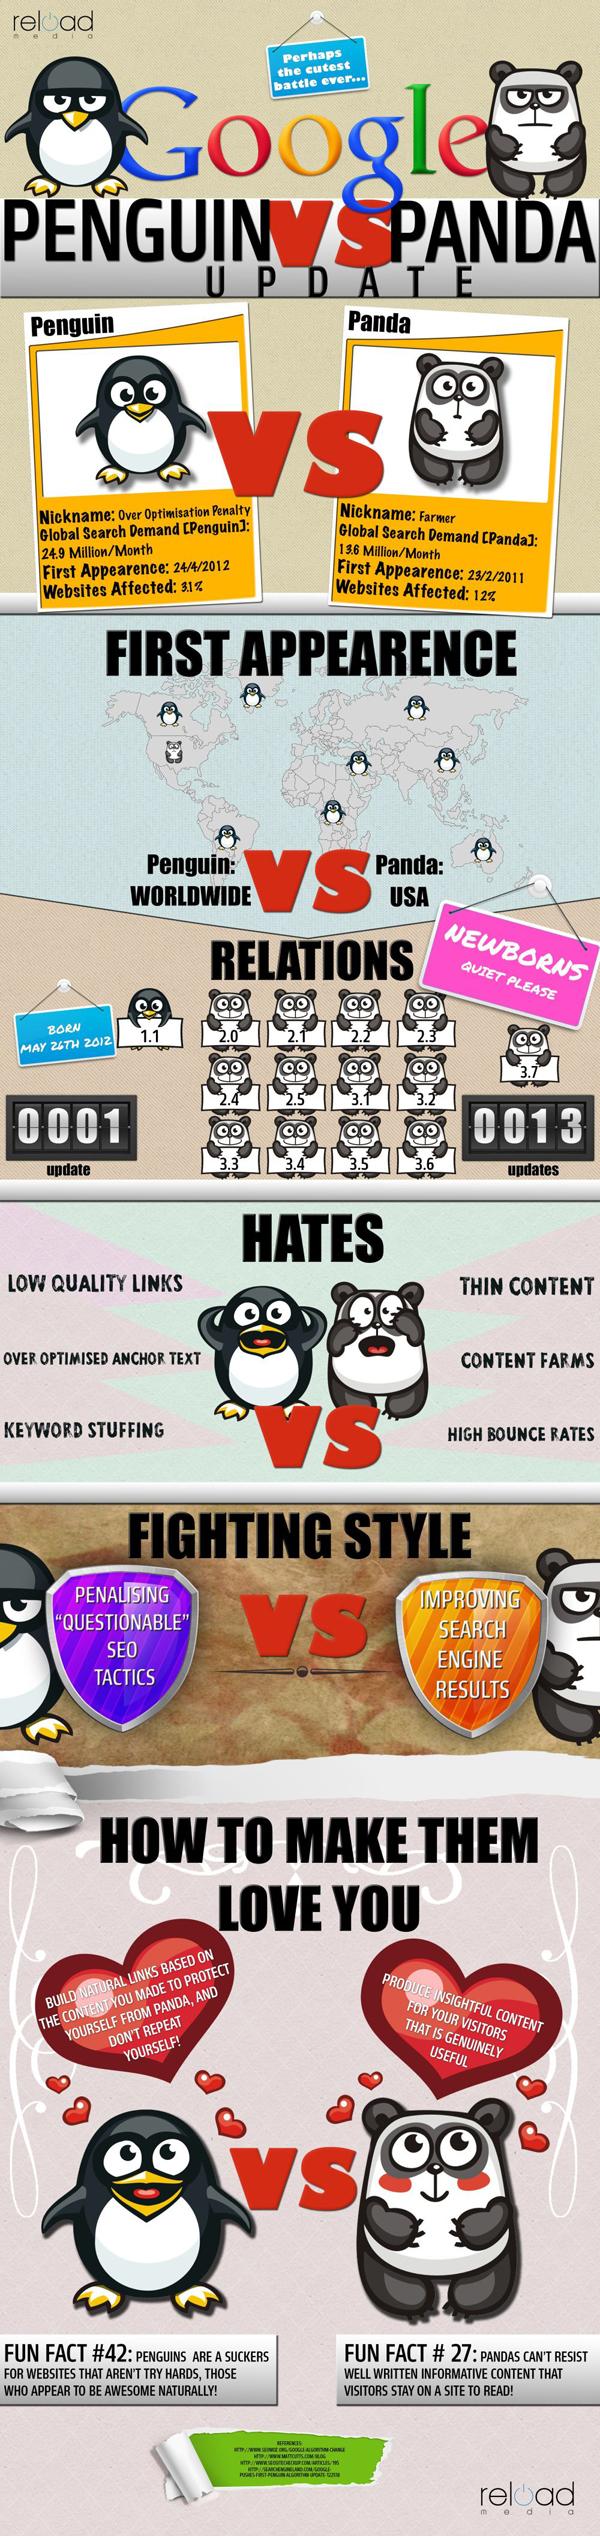 Pinguin vs. Panda Google Updates der Suchalgorithmen